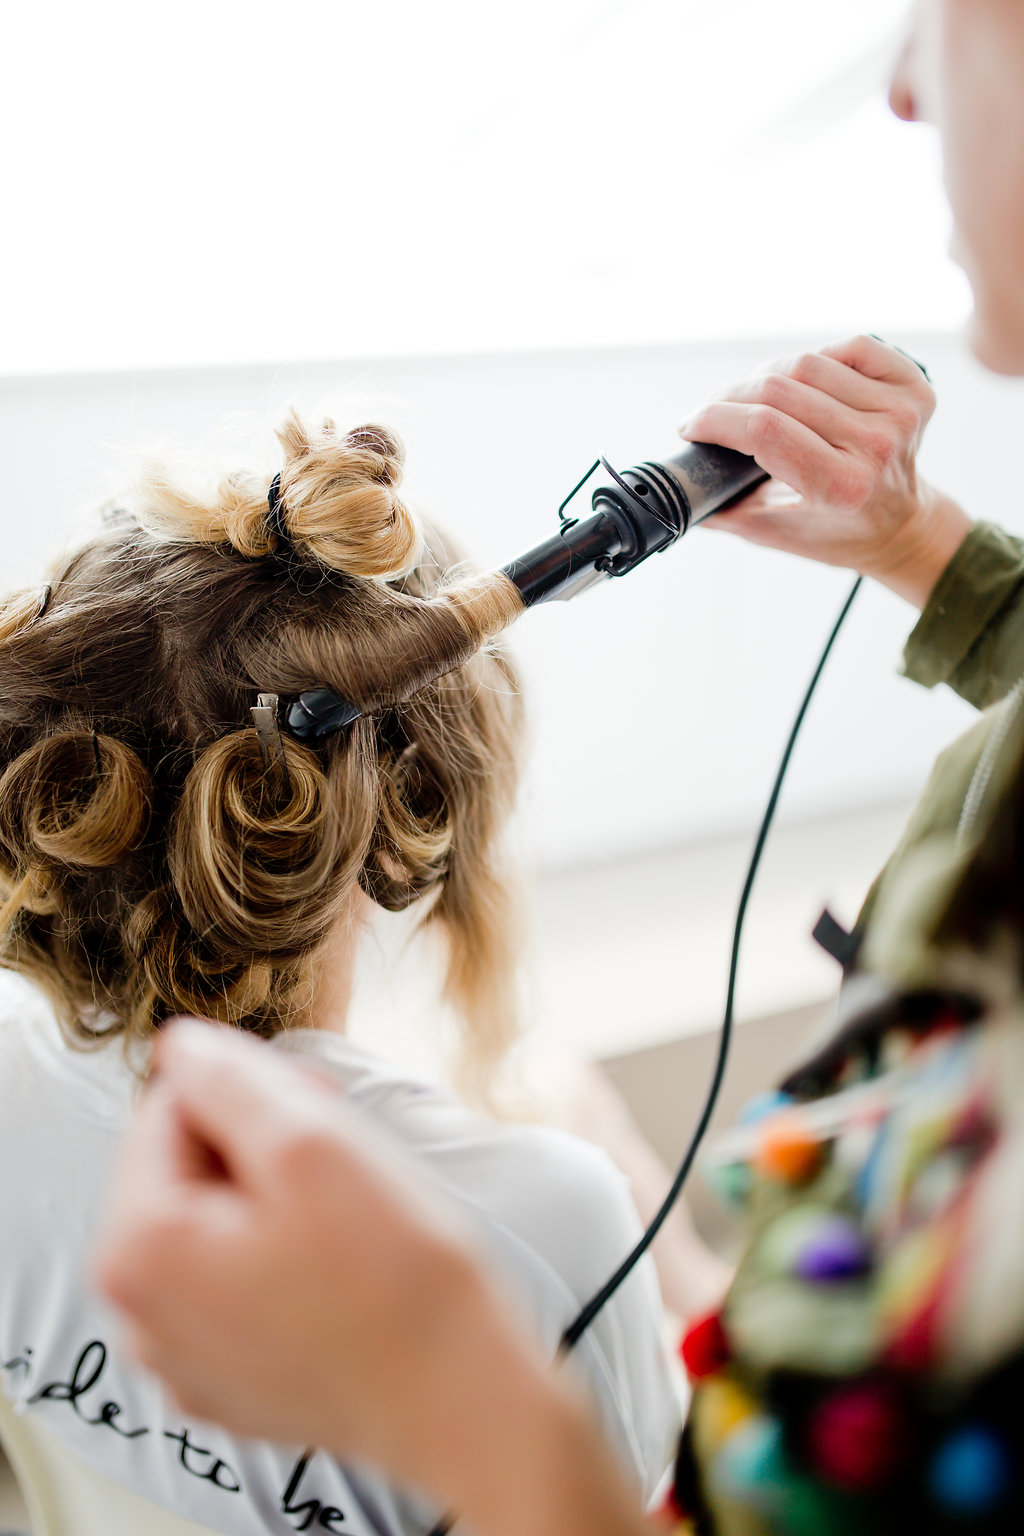 le coeur dans les etoiles - wedding planner - provence - sardaigne - shooting inspiration - mariage voilier - audrey carnoy - coiffure mariee 1